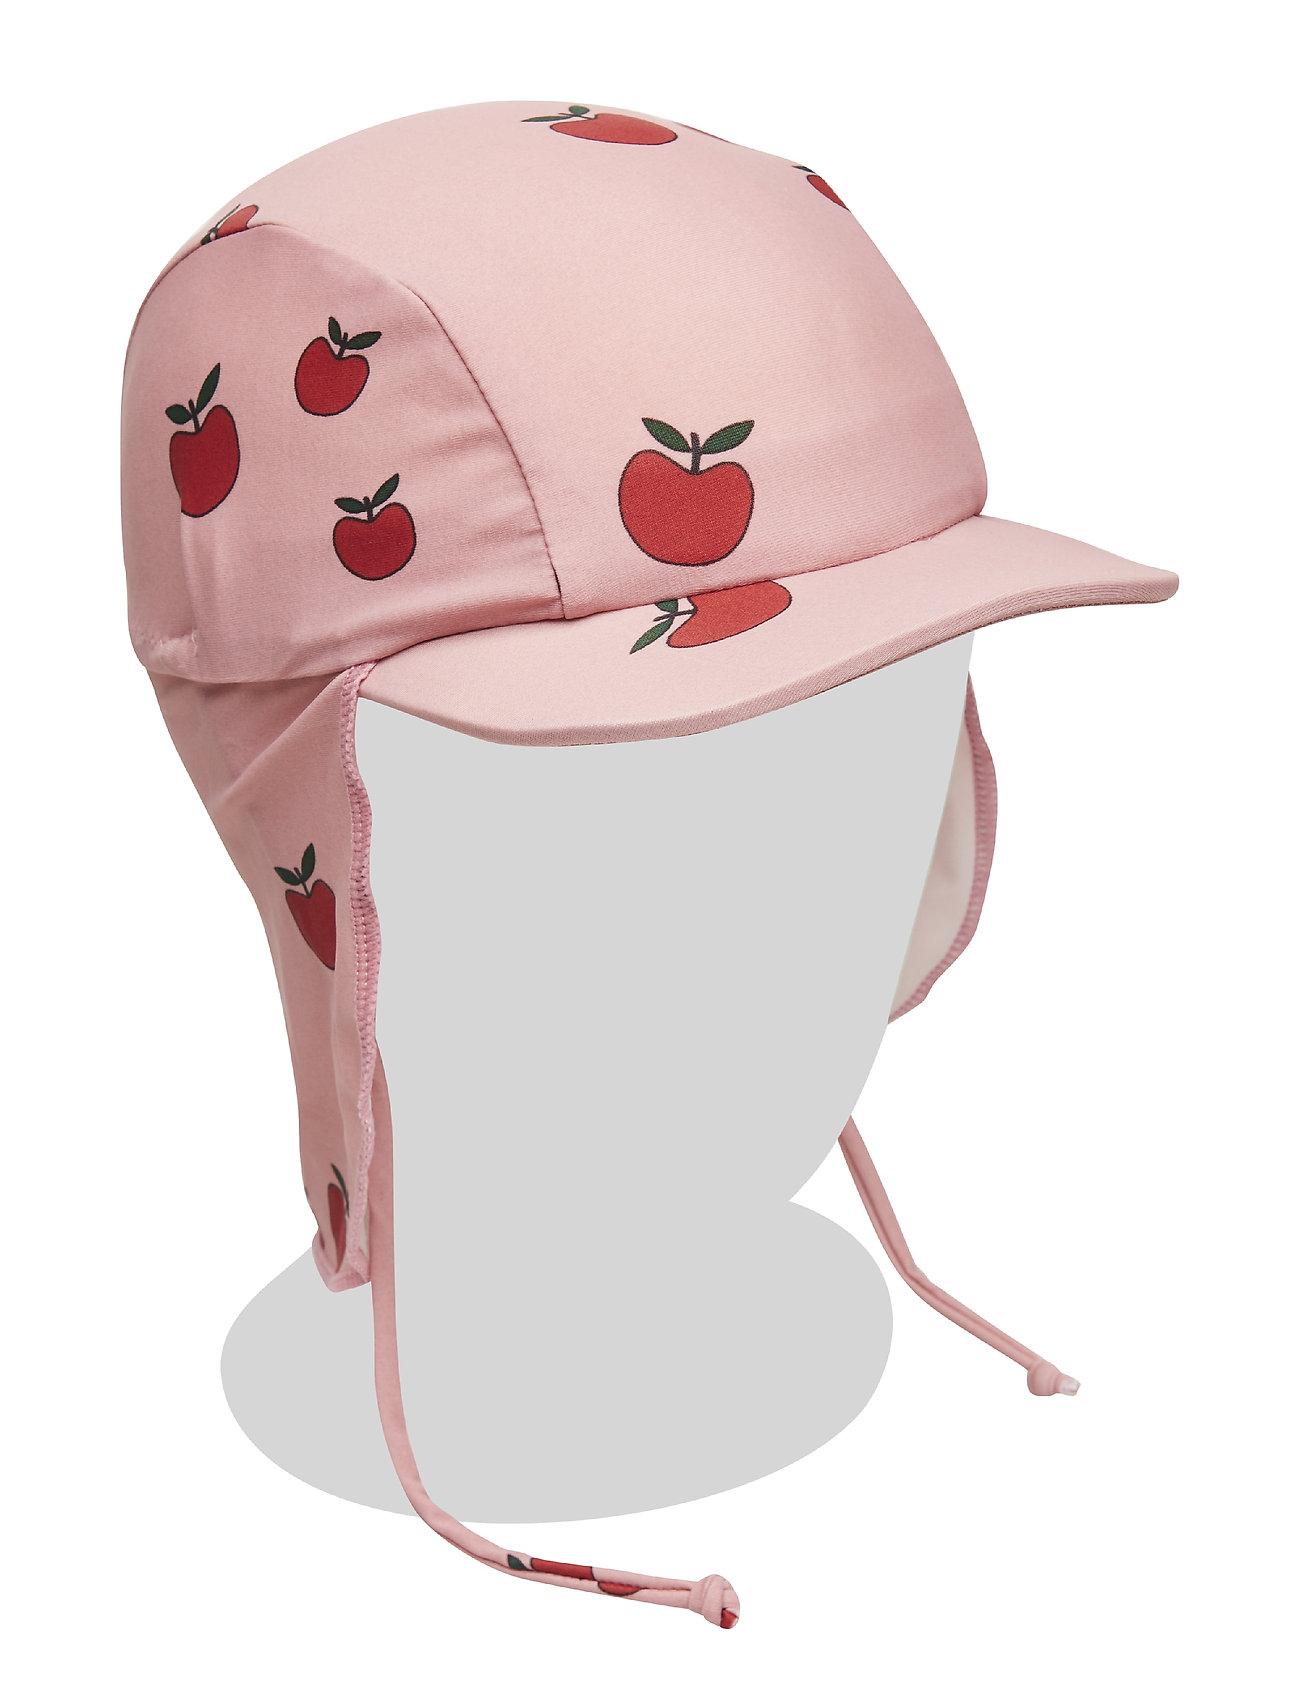 Småfolk Swimwear, Sun cap. Apple - BLUSH